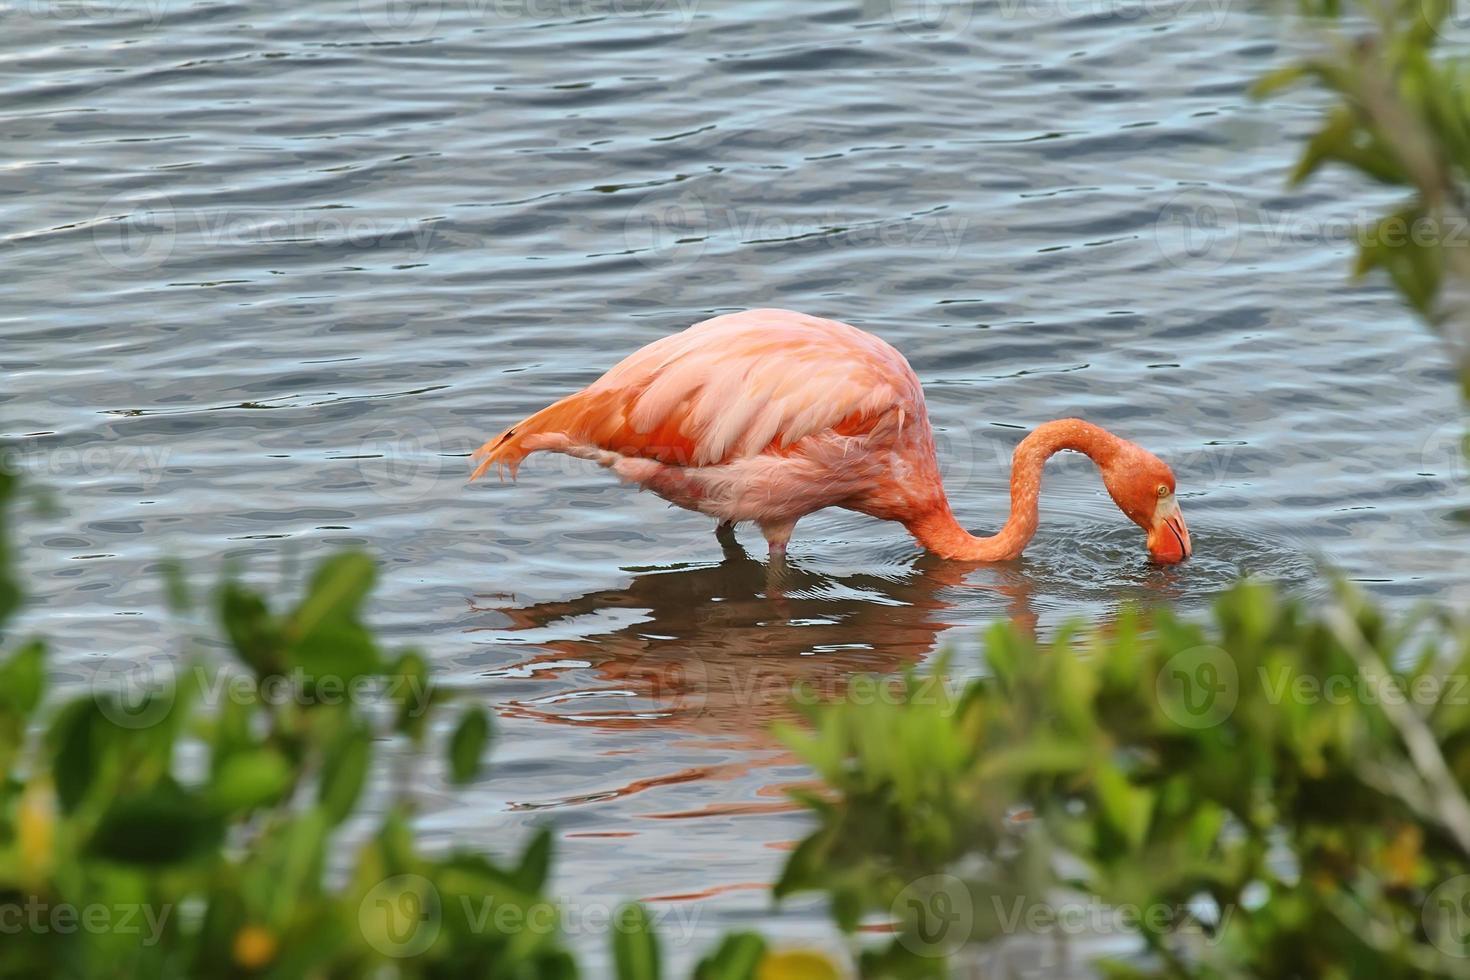 rosa größerer Flamingo in den Galapagosinseln foto